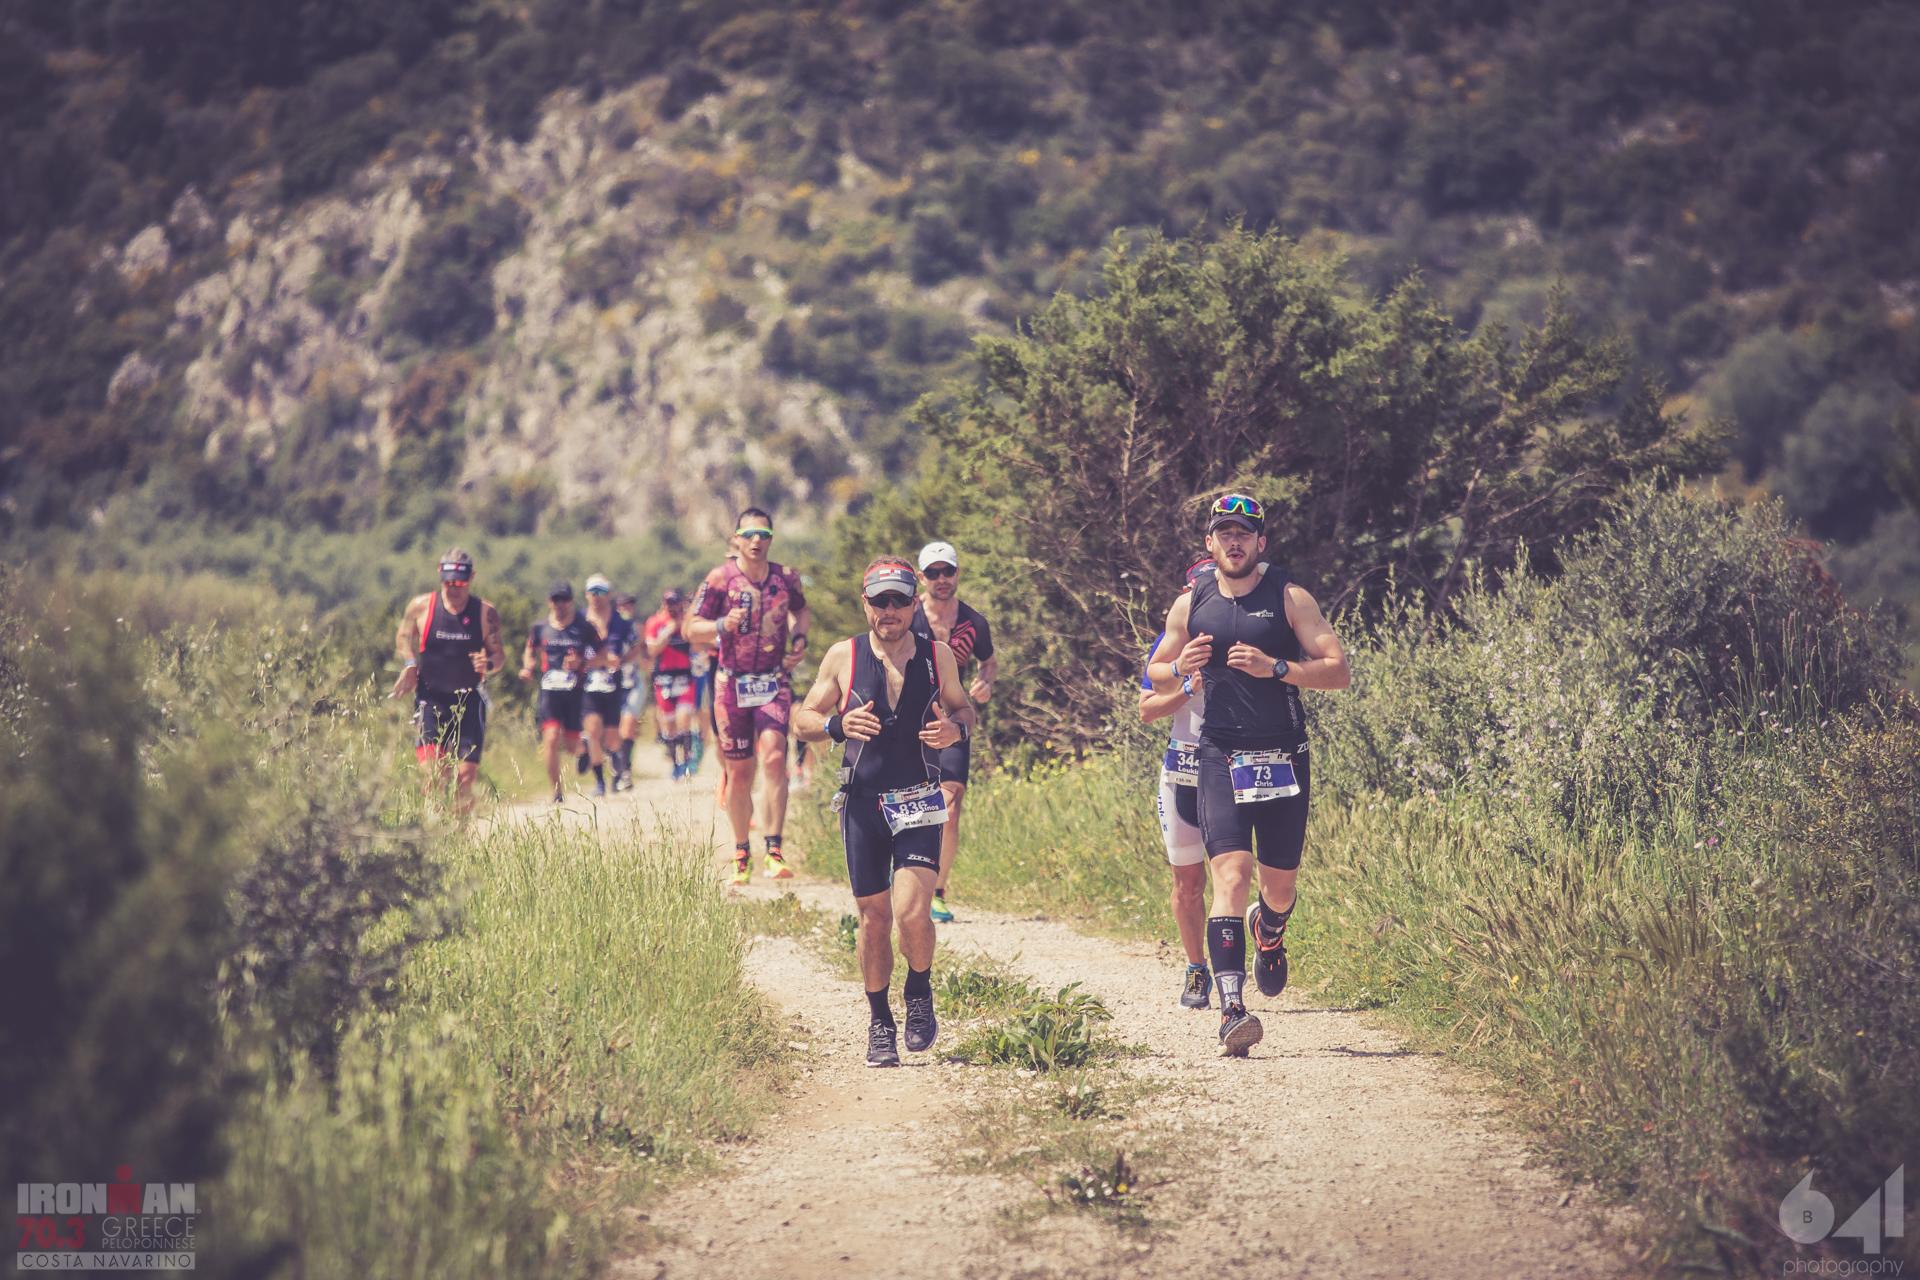 21.1 km run